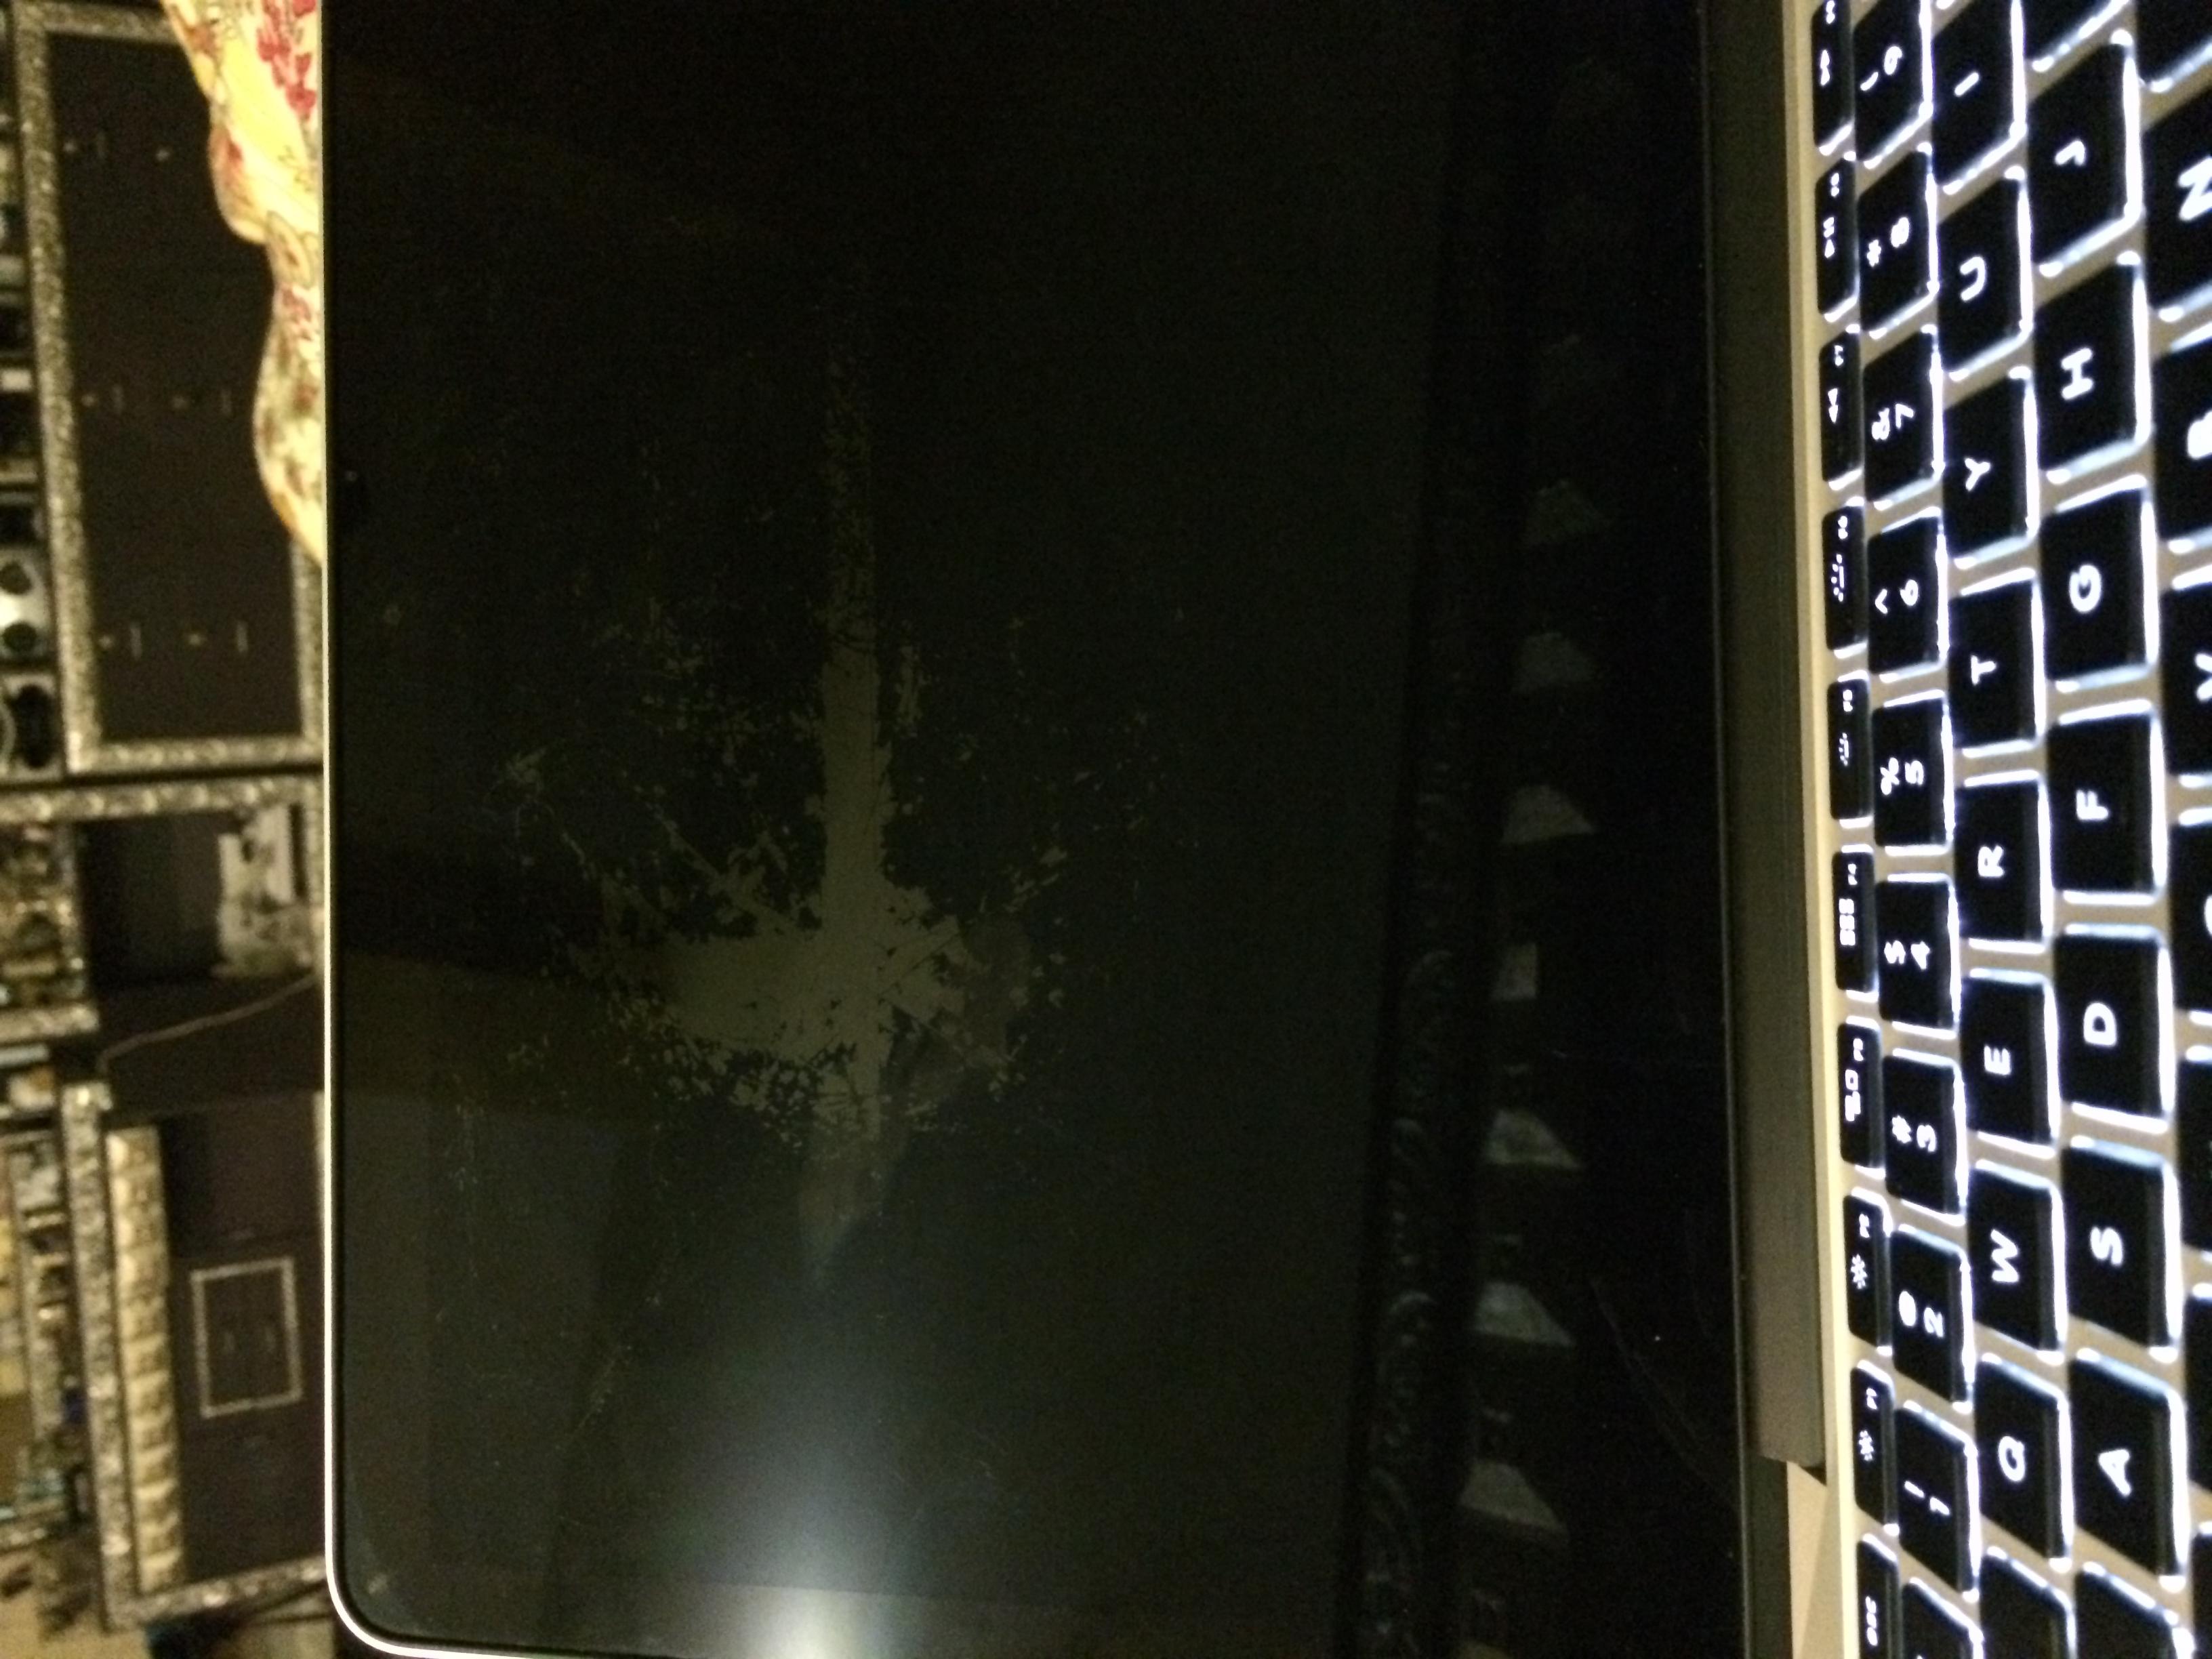 Macbook pro retina screen damaged using a… - Apple Community